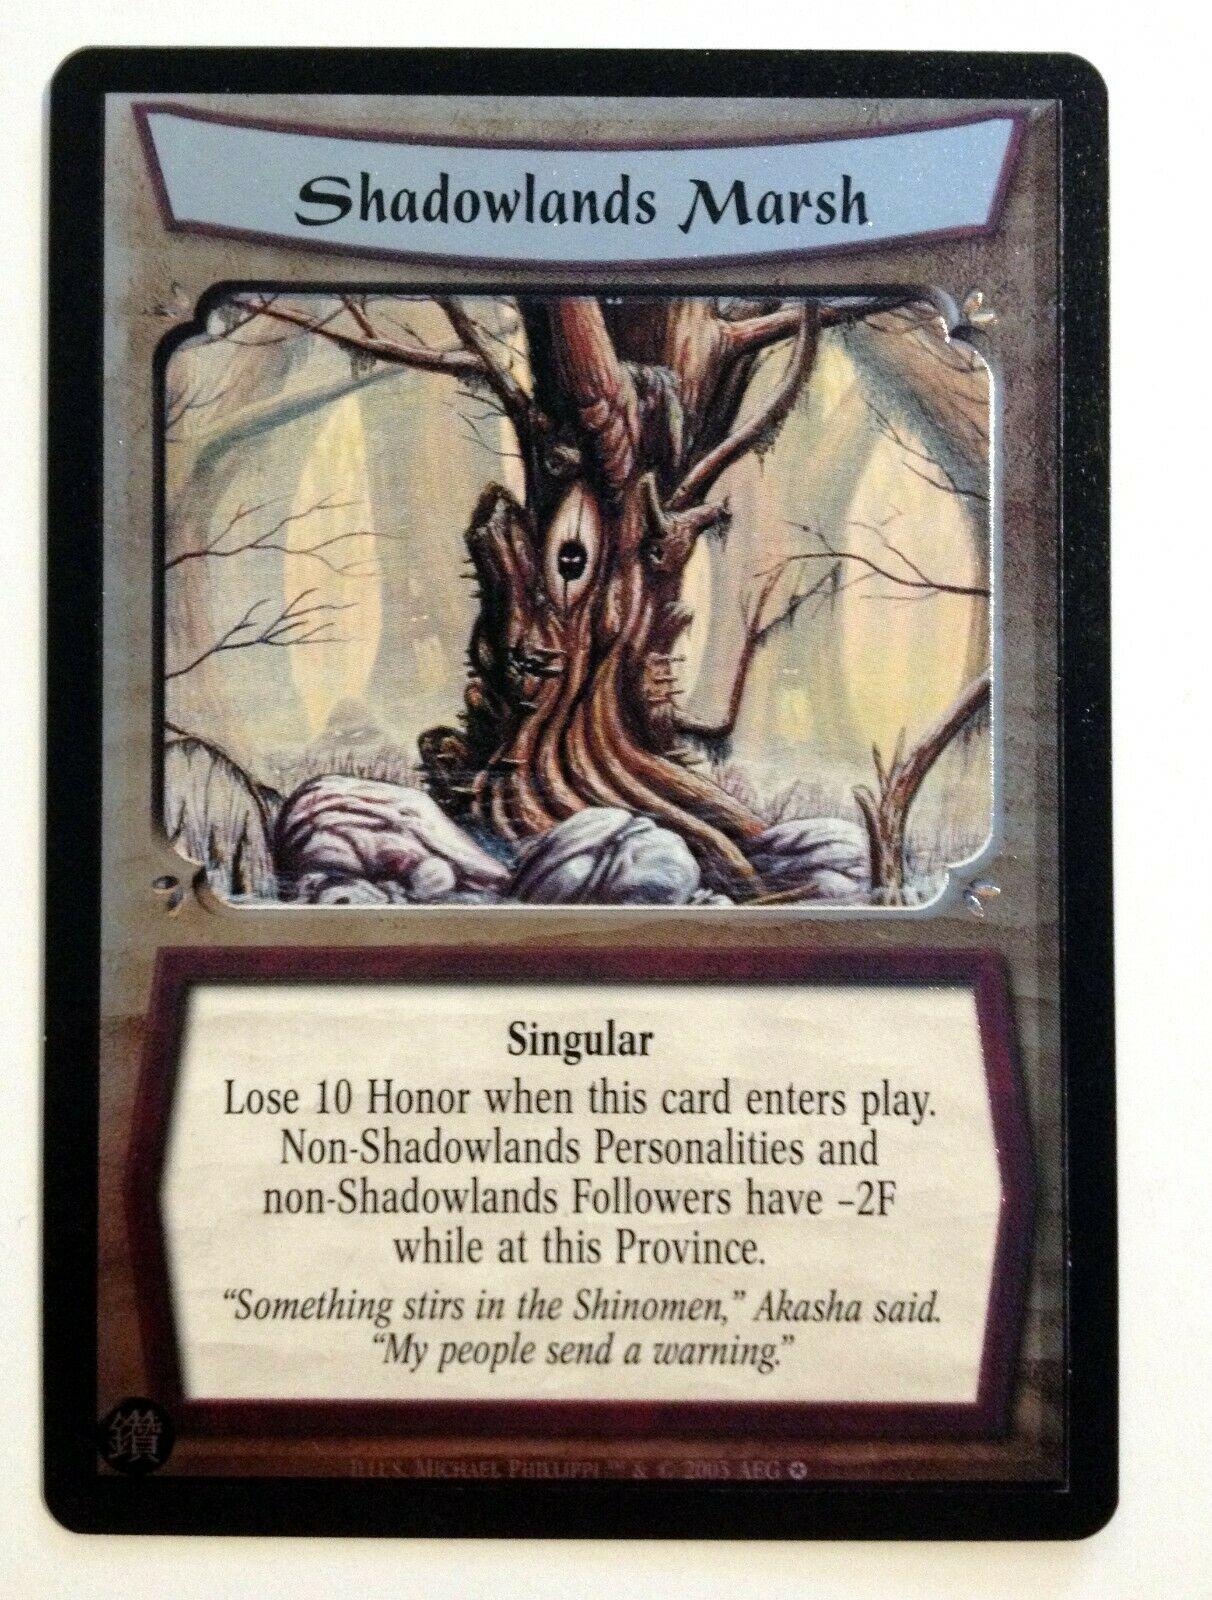 File:Shadowlands Marsh-card4.jpg